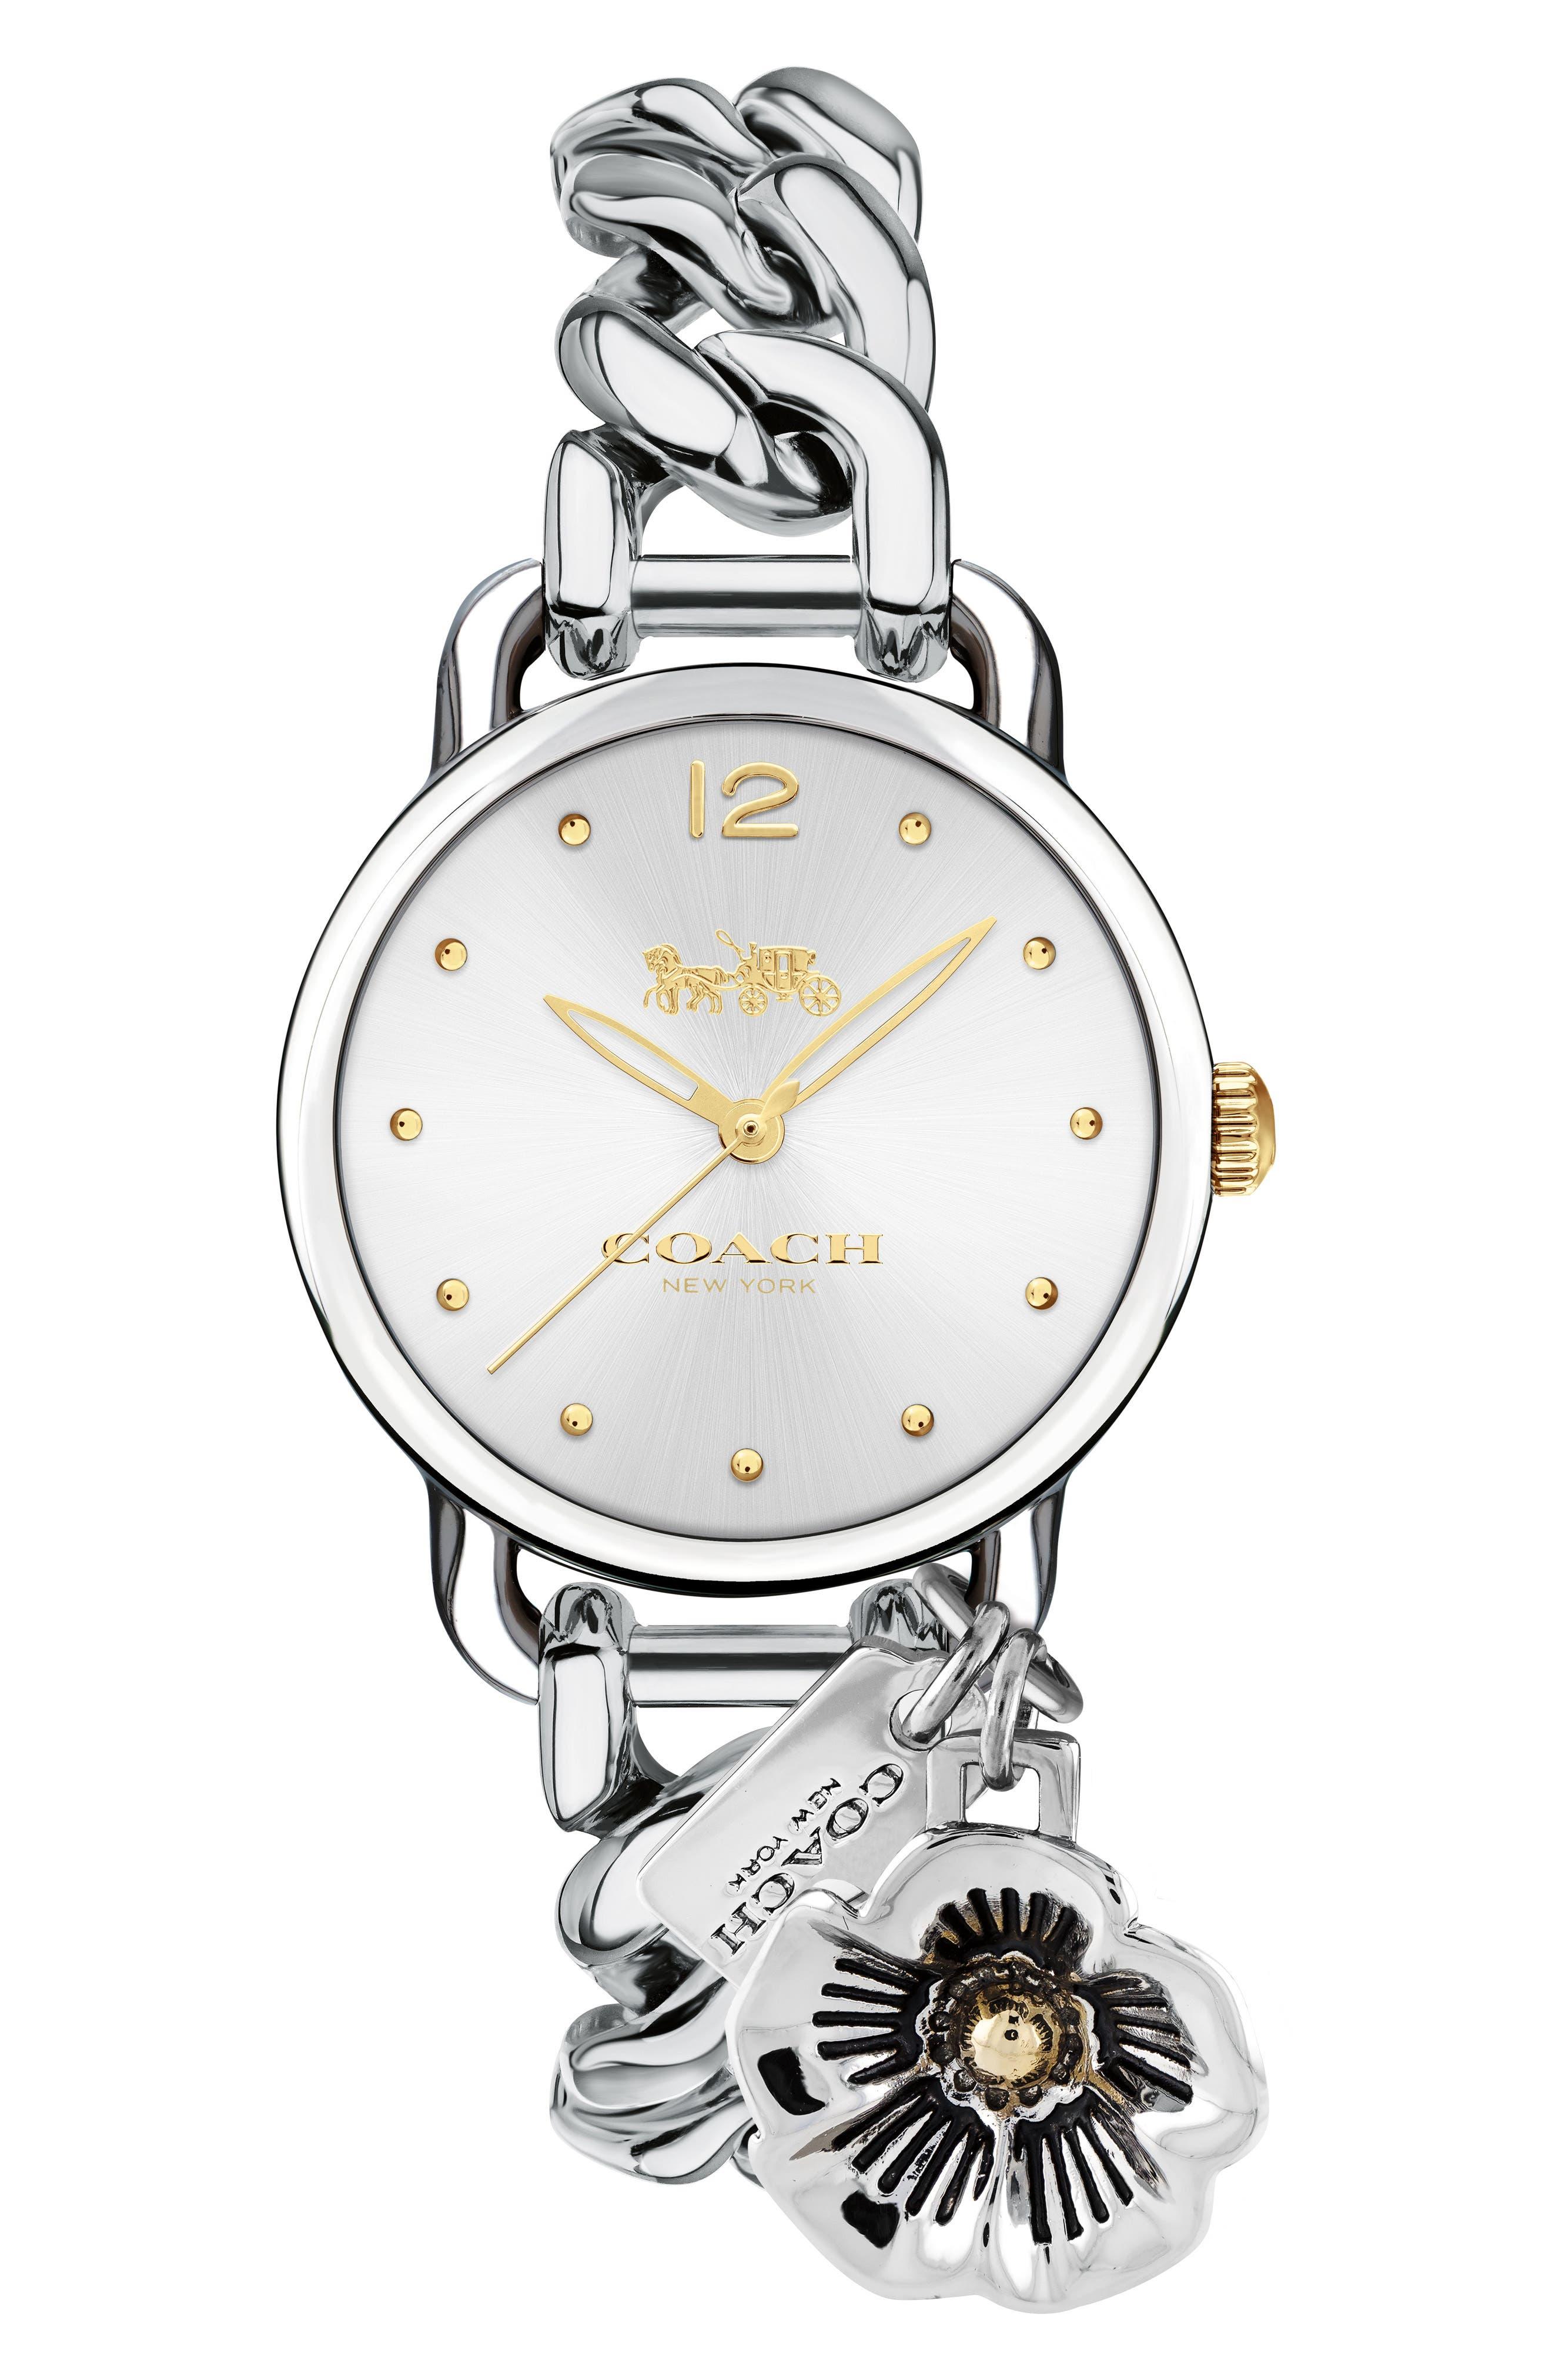 Main Image - COACH Delancey Charm Detail Chain Bracelet Watch, 36mm